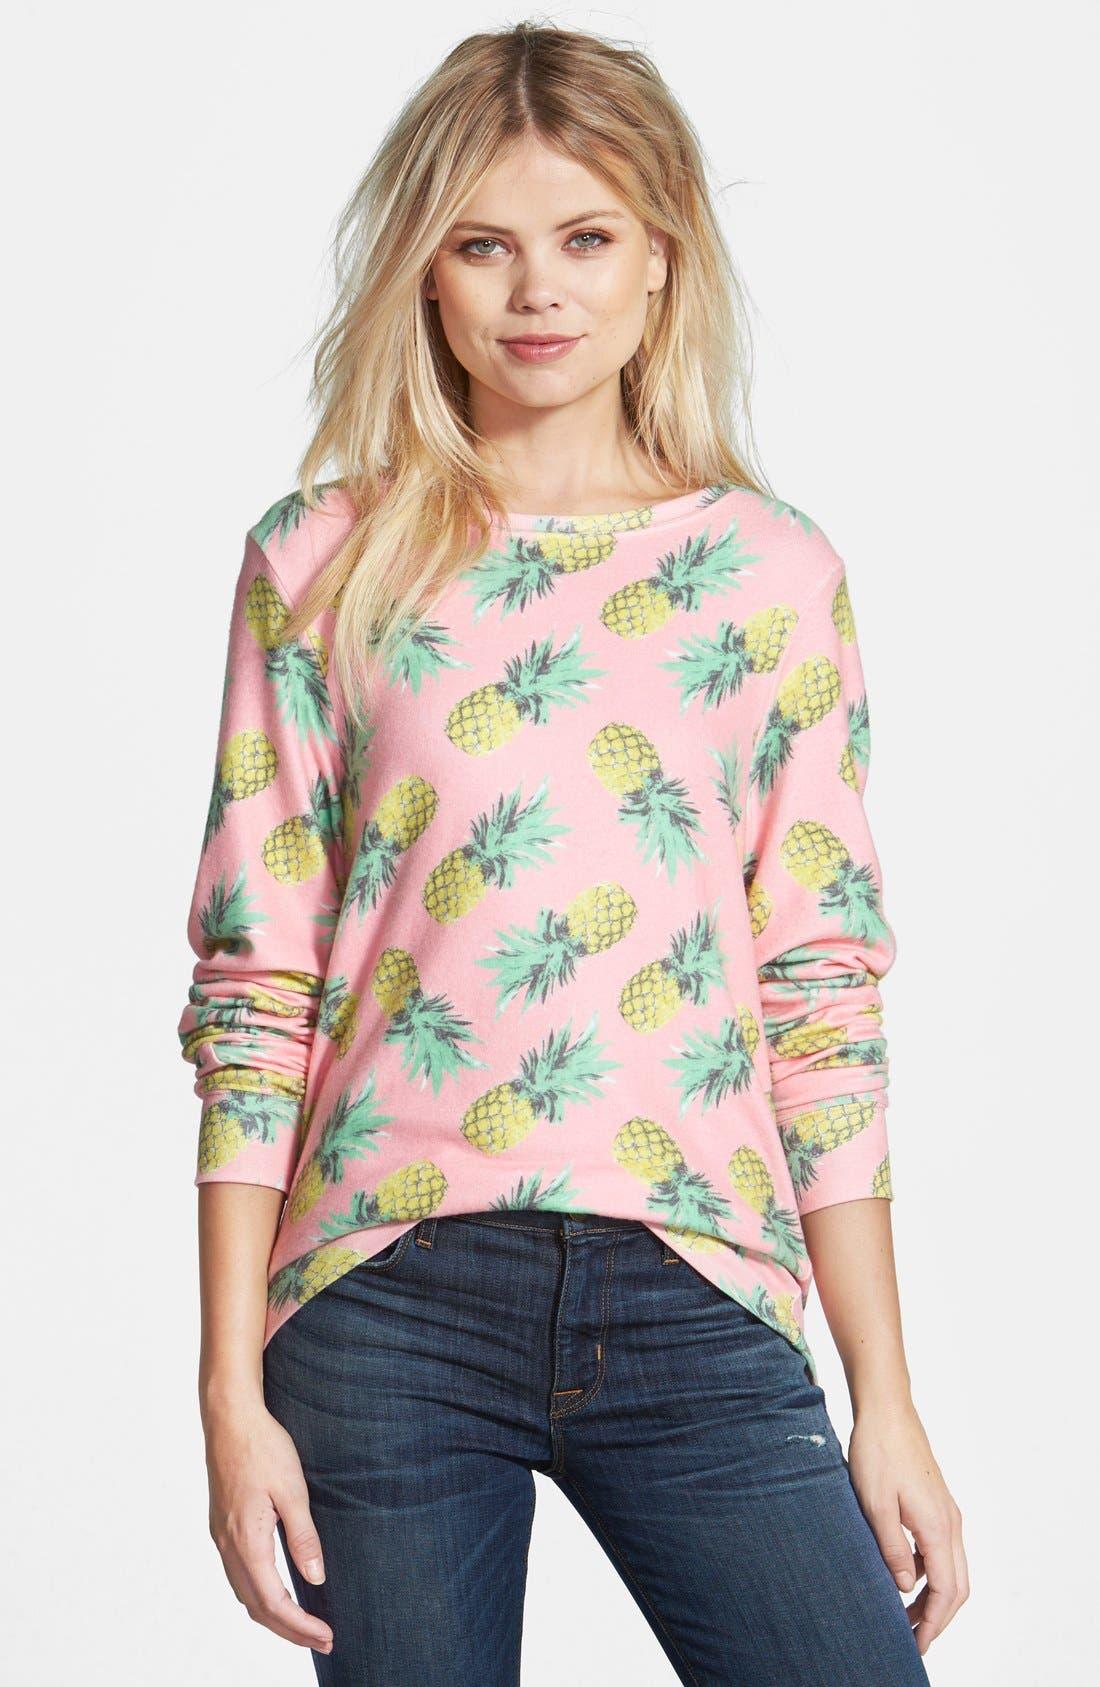 Main Image - Wildfox 'Pineapple Palace' Sweatshirt